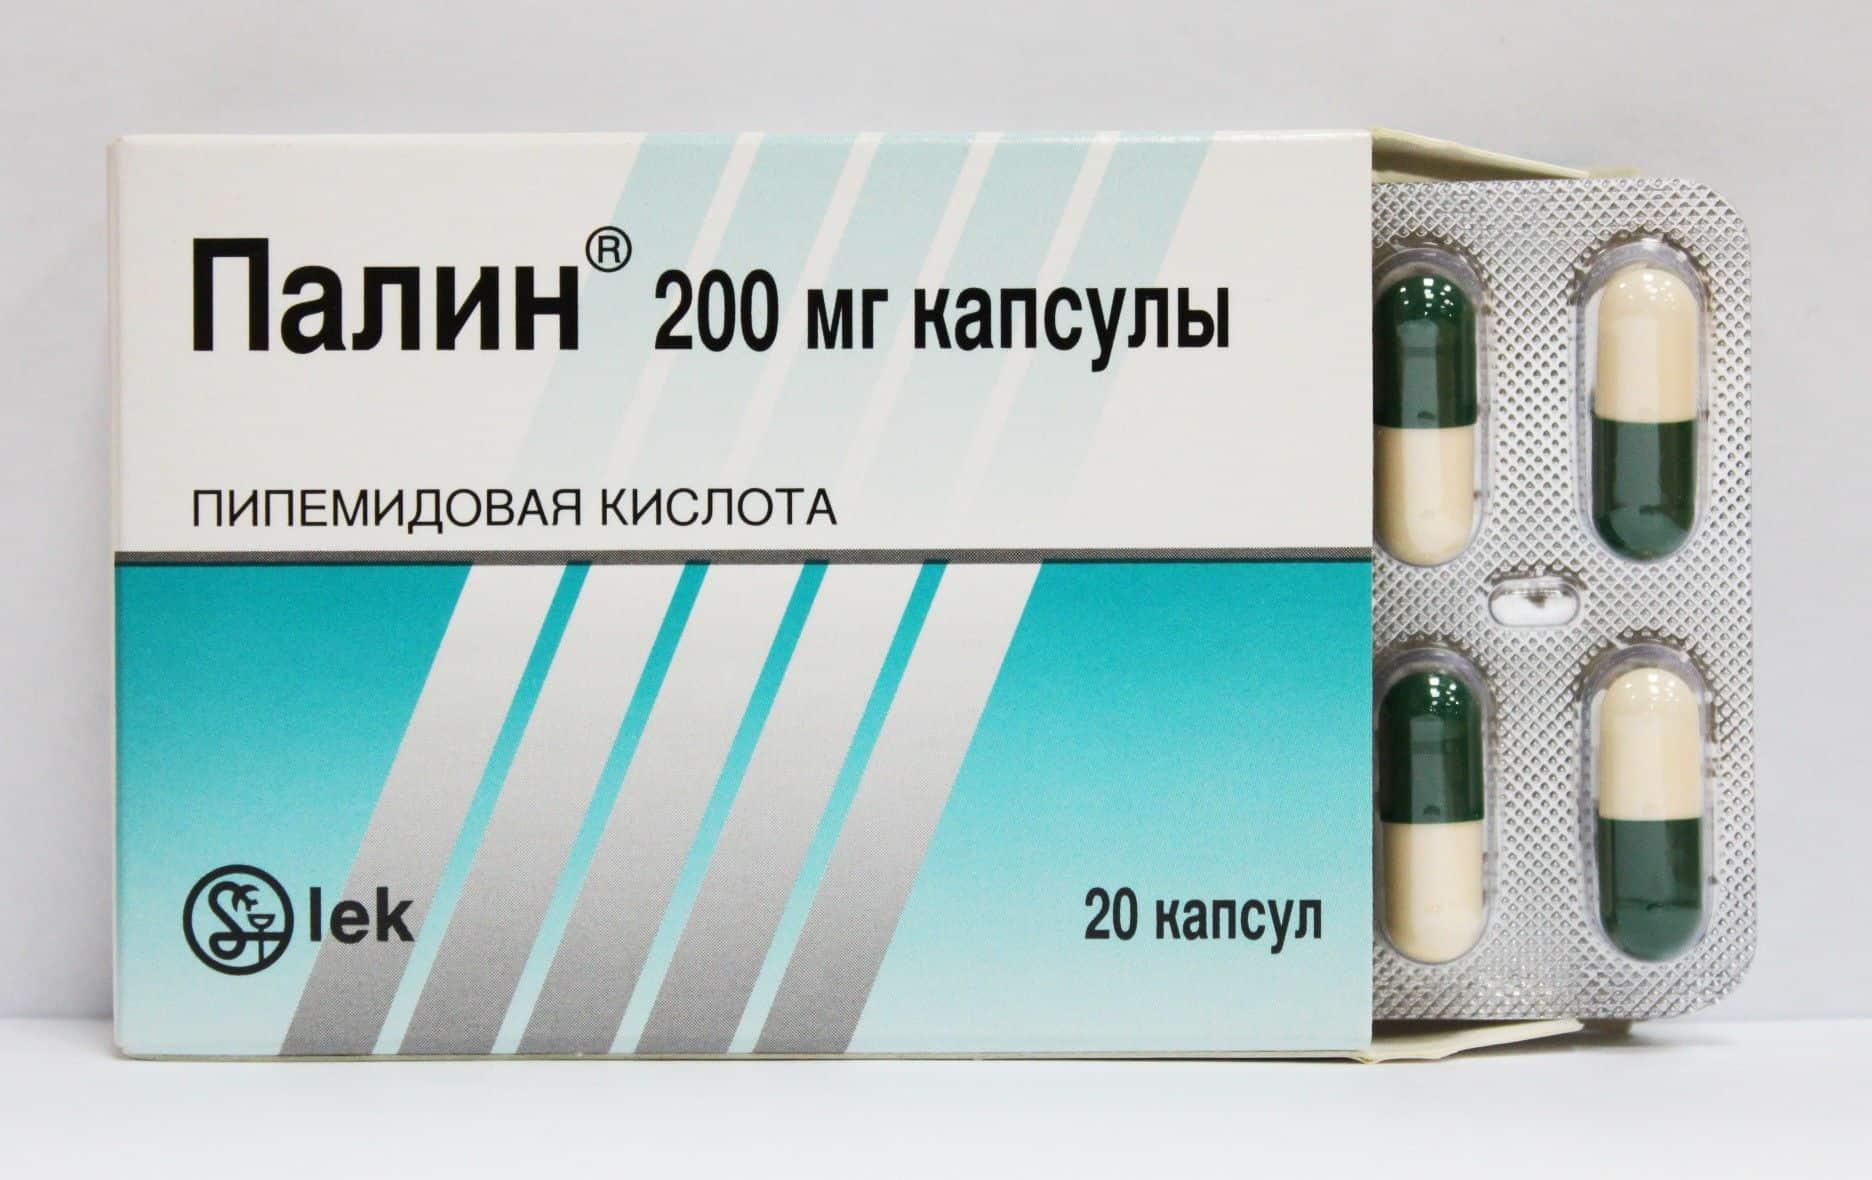 Palin (pipemidic acid) capsules 200 mg. №20